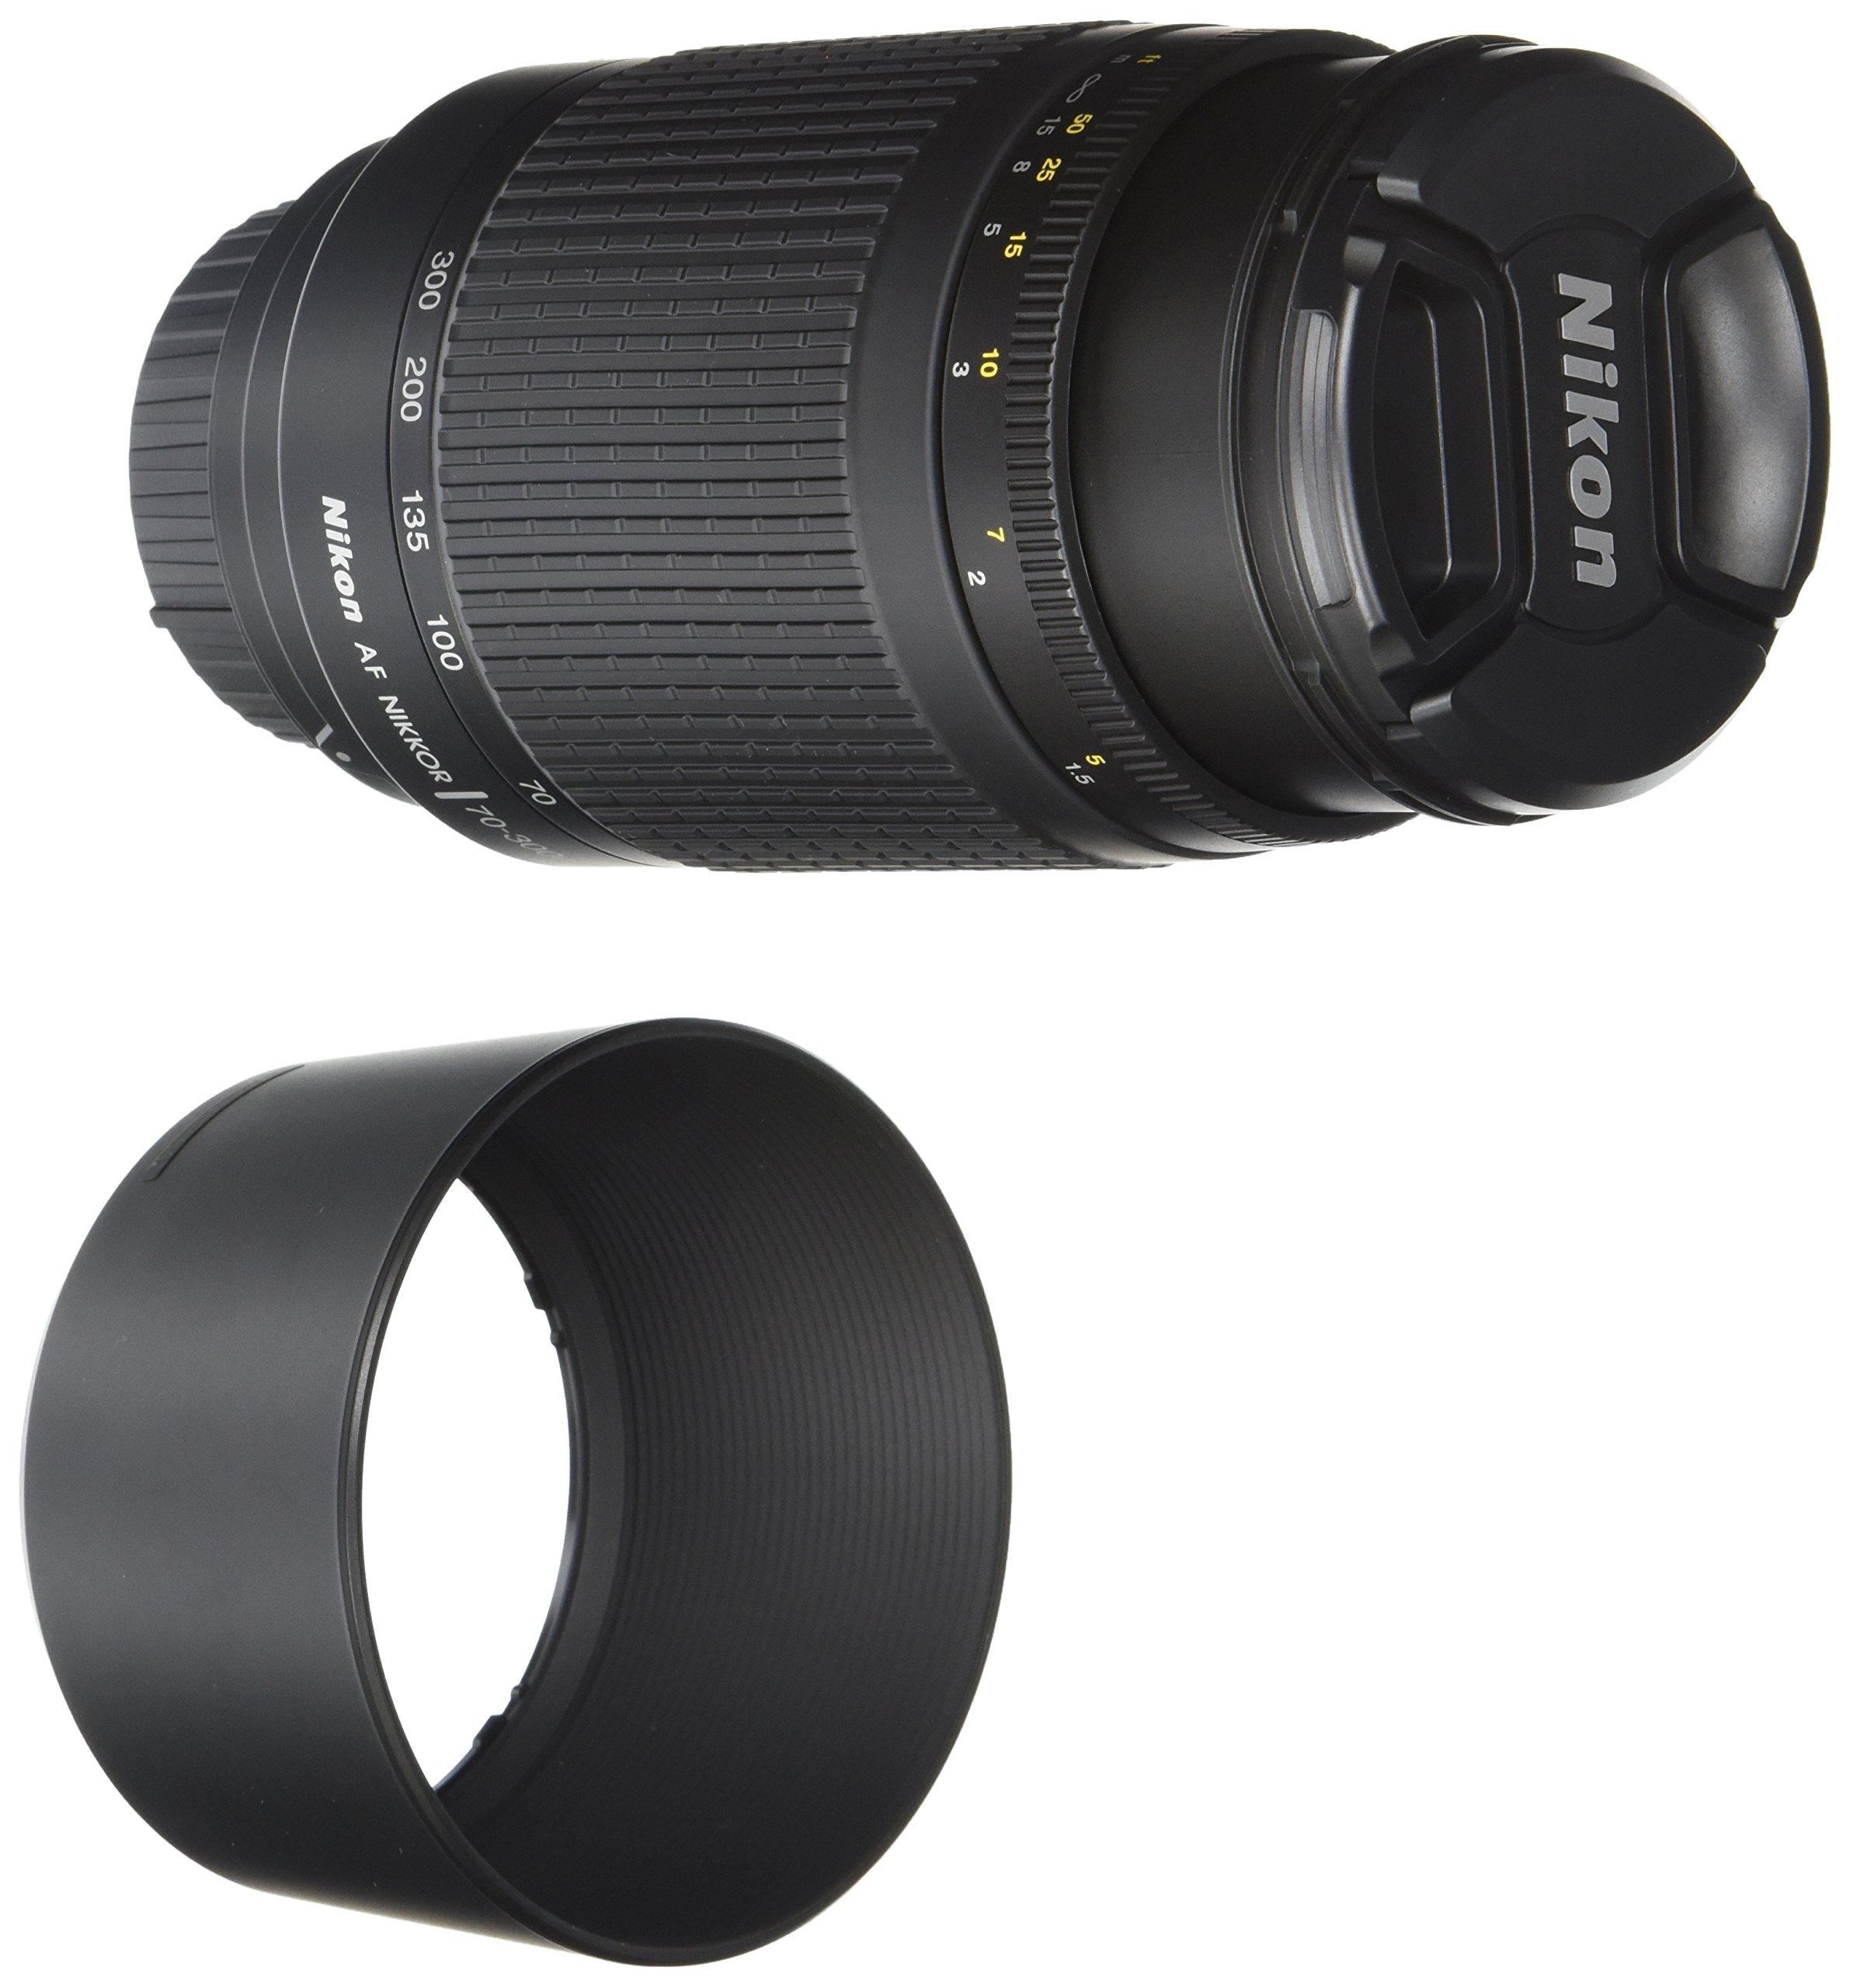 Nikon Obiettivo Nikkor AF 70-300 mm, f/4-5.6G, Nero [Versione EU]